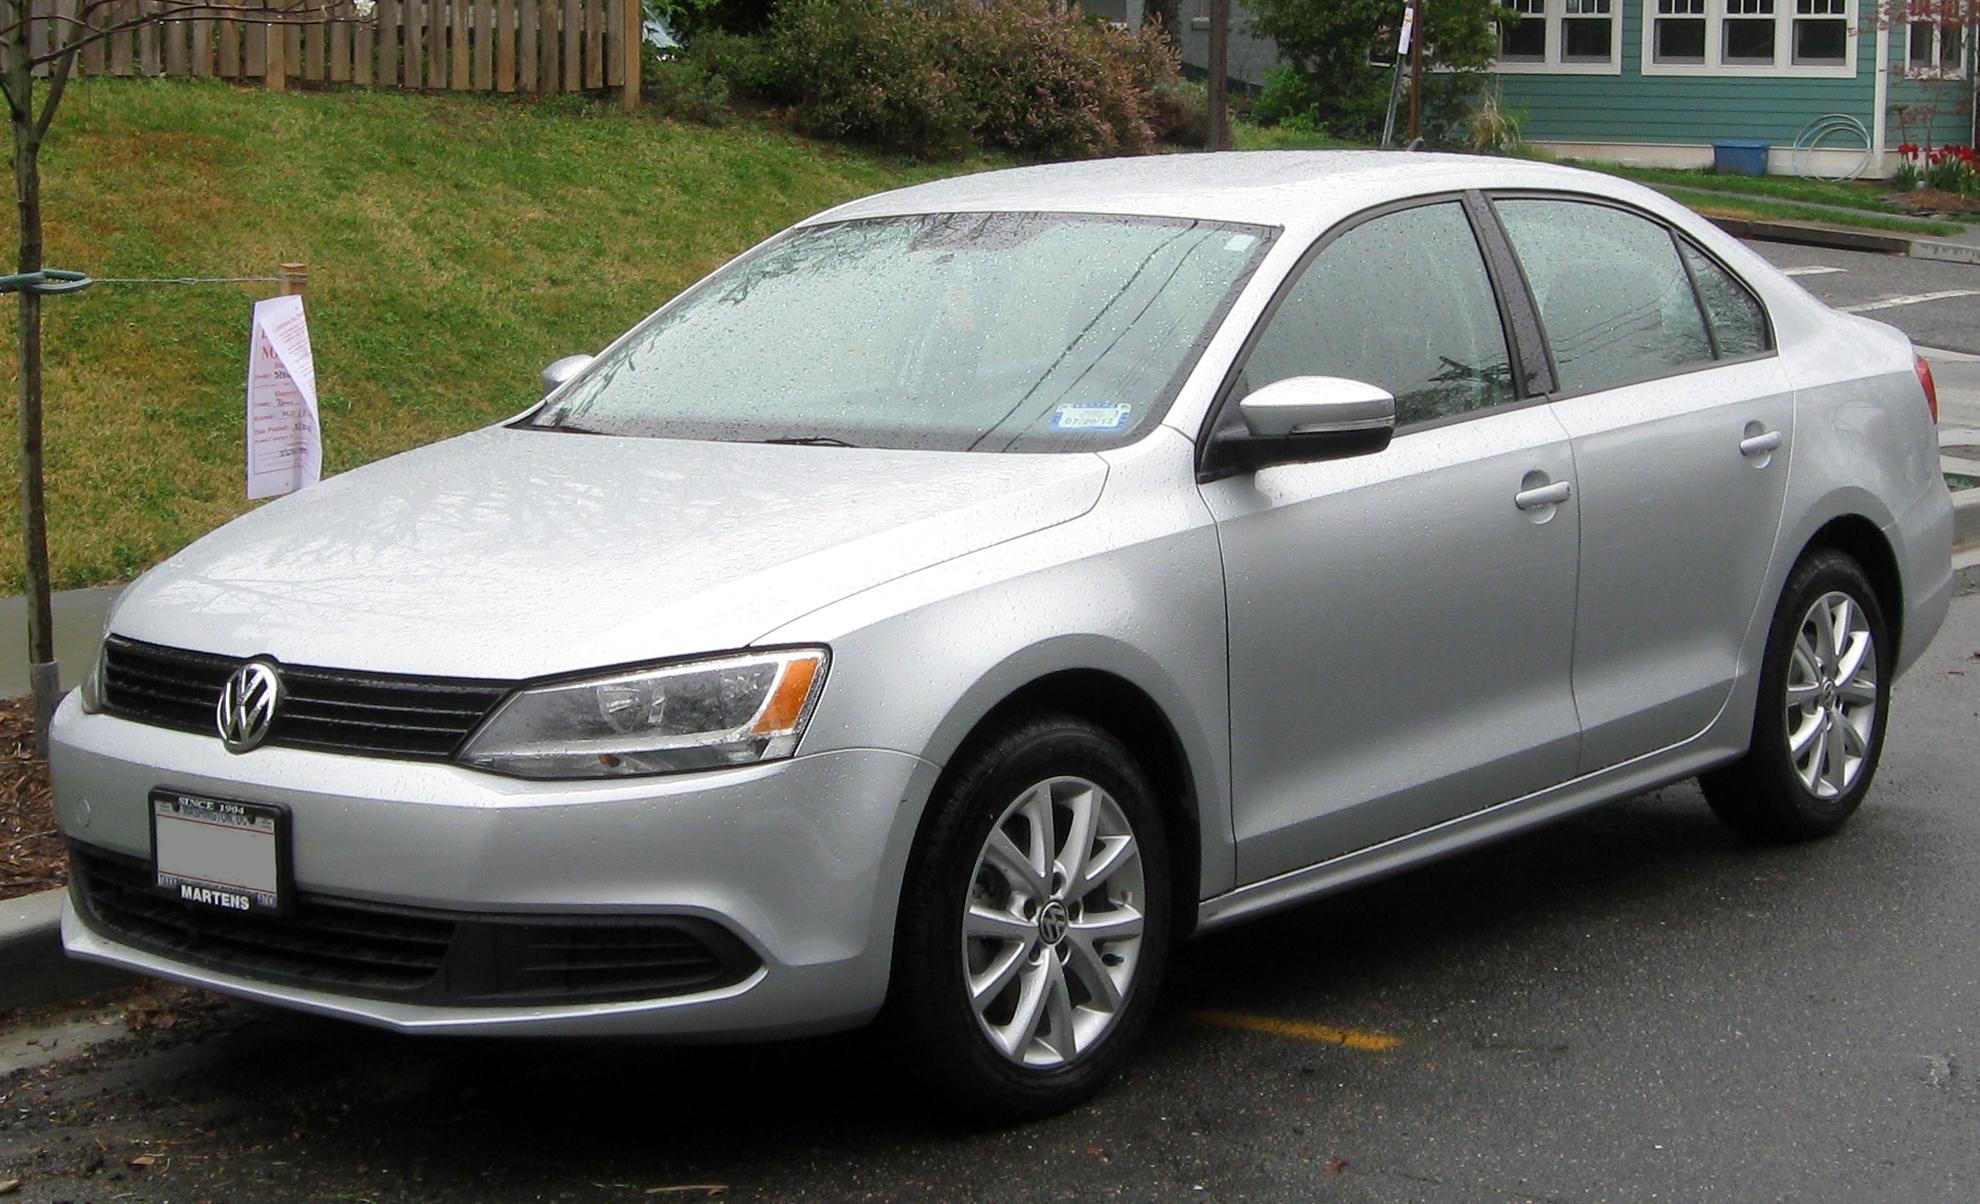 File:Volkswagen Jetta sedan -- 03-24-2012.JPG - Wikimedia Commons